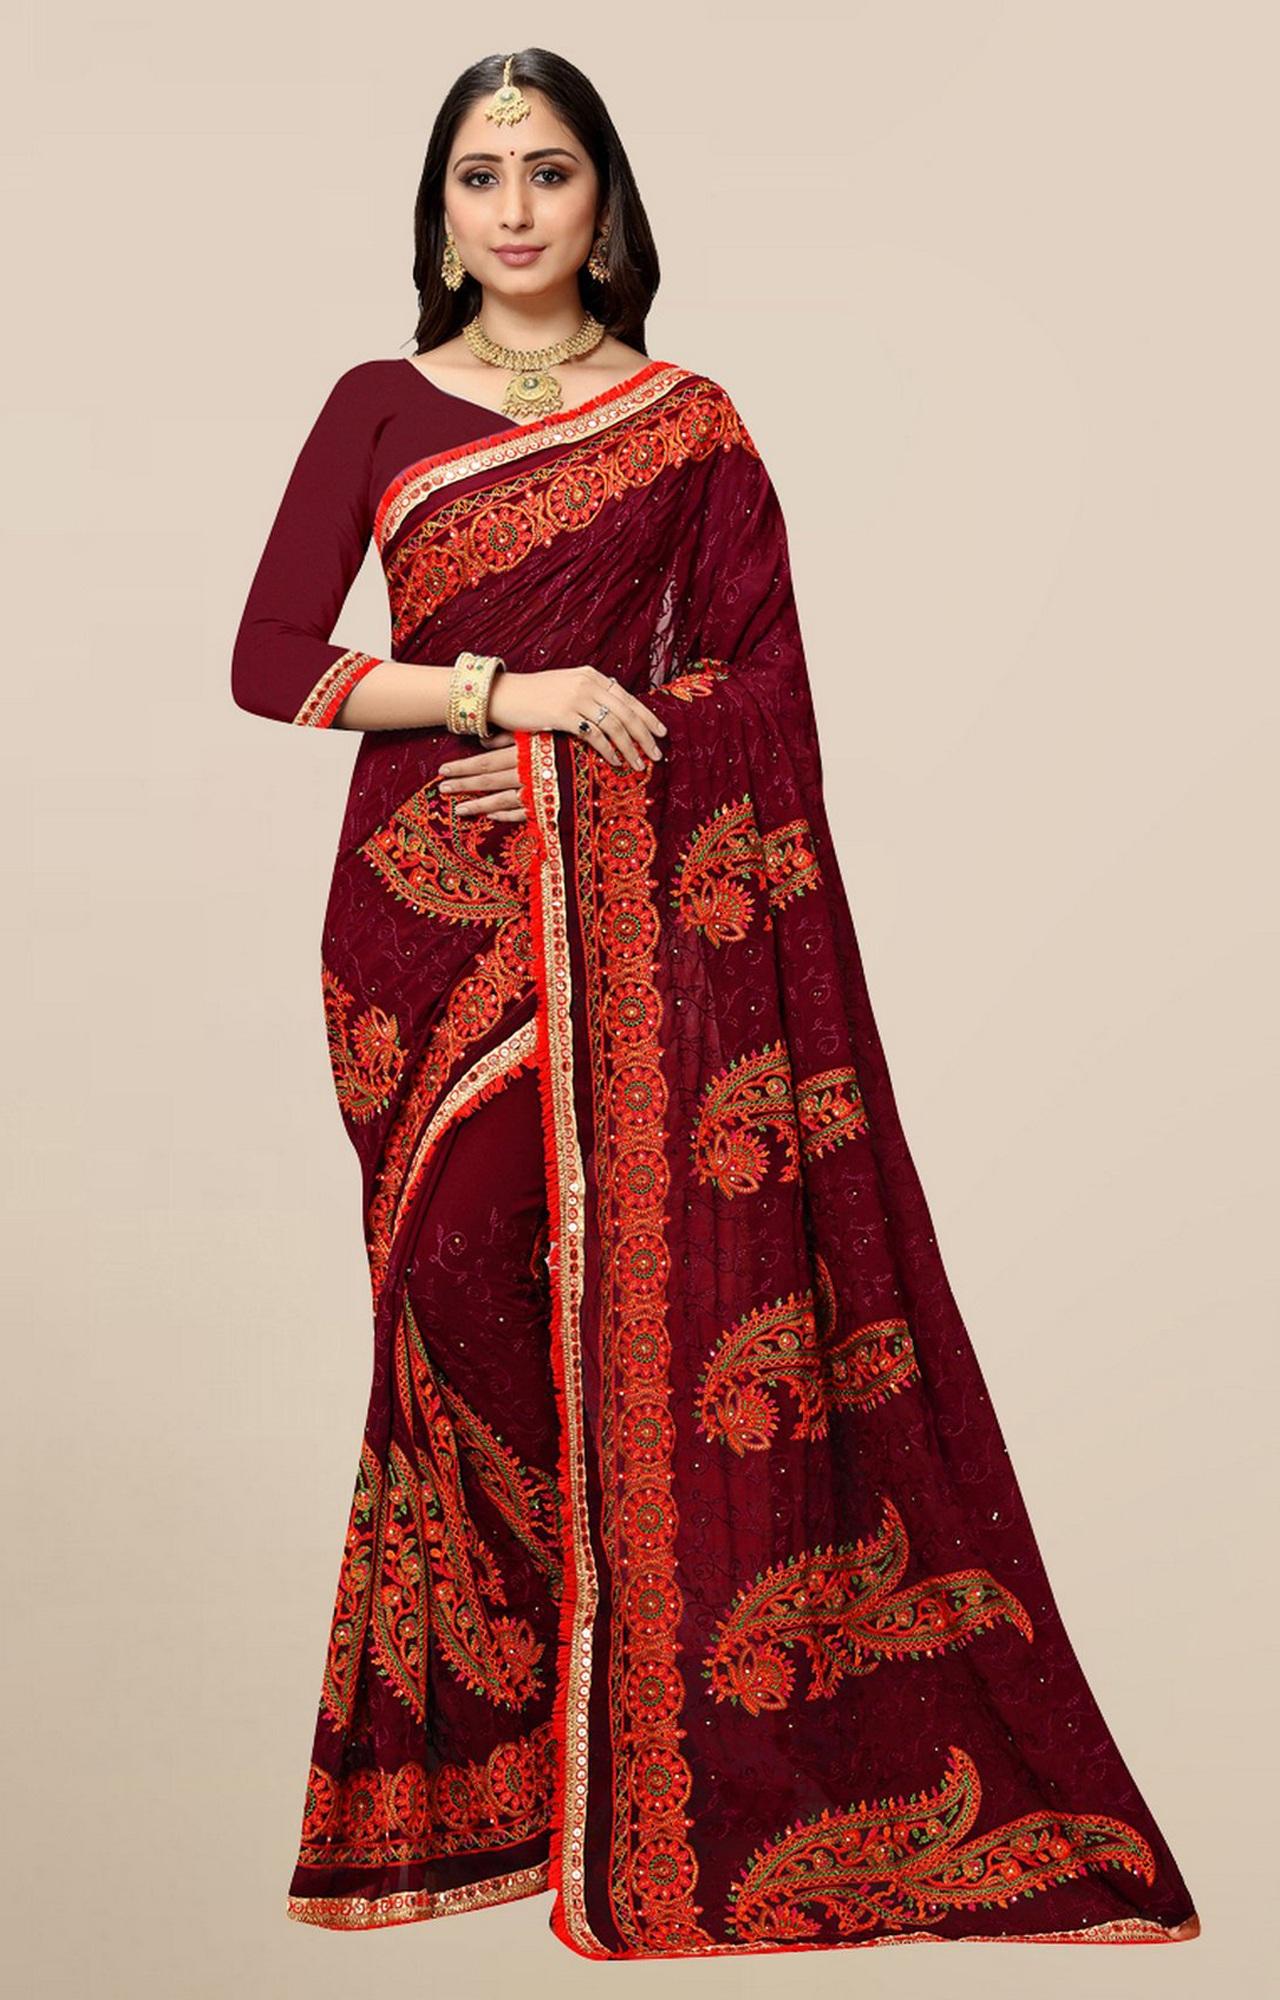 SATIMA | Designer Maroon Georgette Self-Design Embroidered Saree